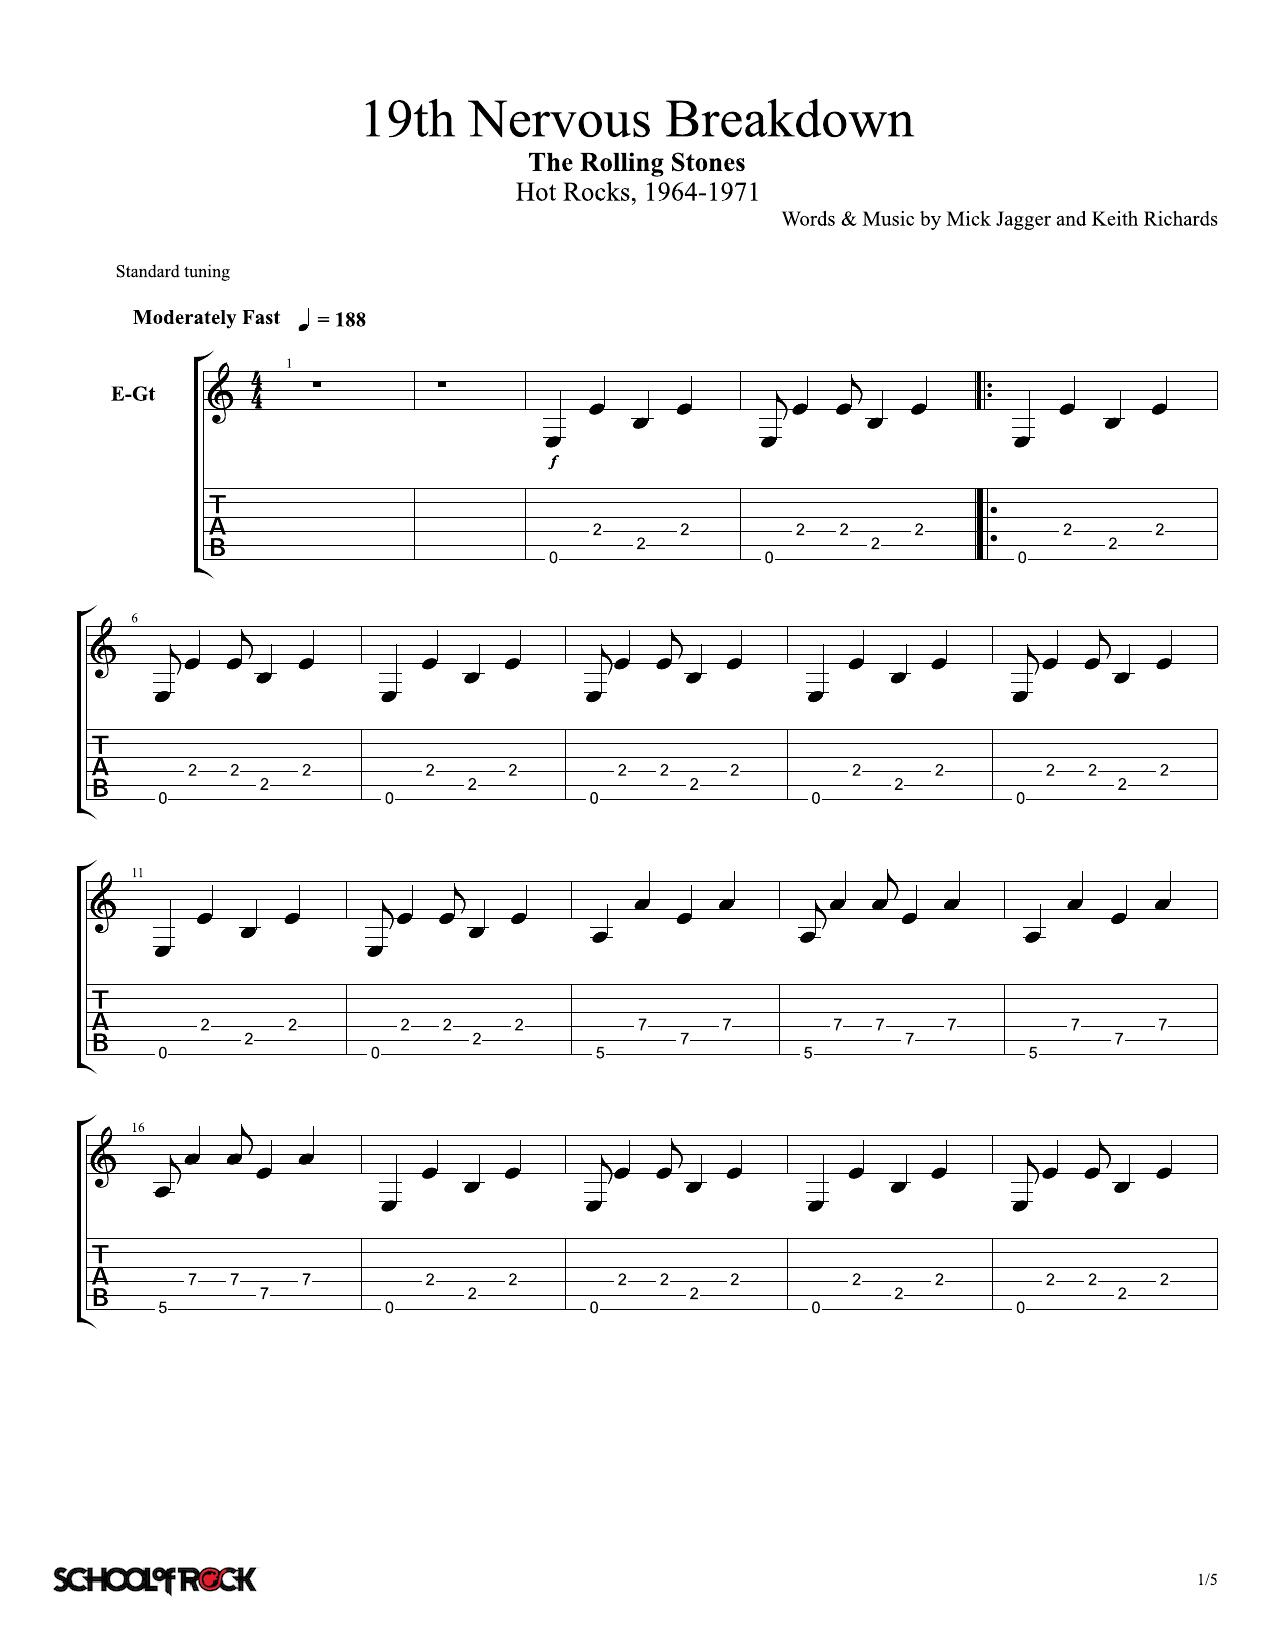 19th Nervous Breakdown by Rolling Stones School of Rock – Rhythm Guitar Tab  Digital Sheet Music